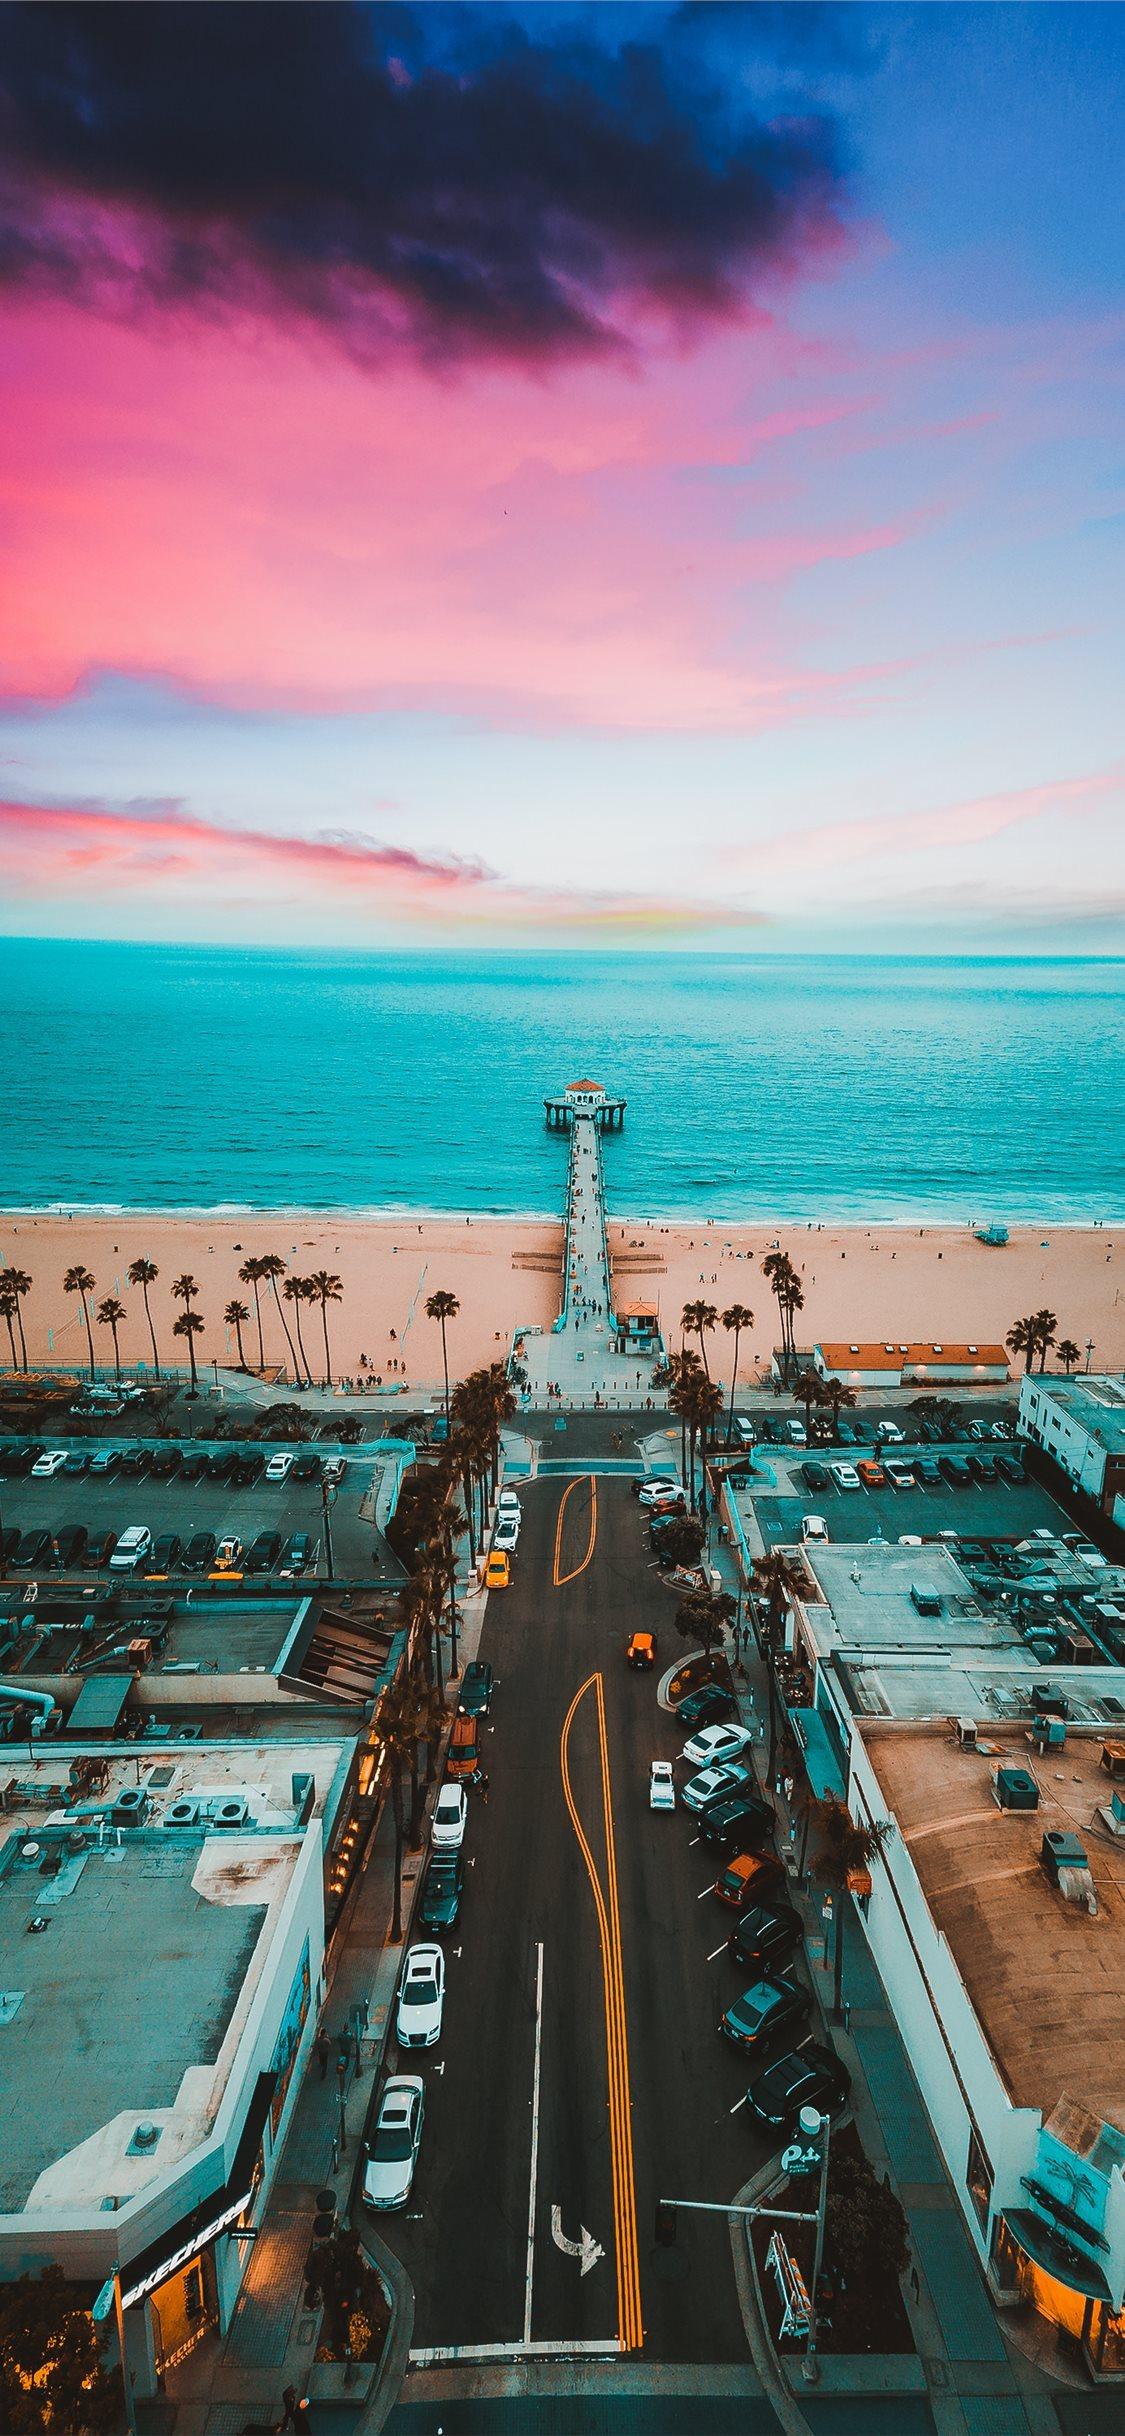 Manhattan Beach Pier Iphone X Wallpapers Free Download